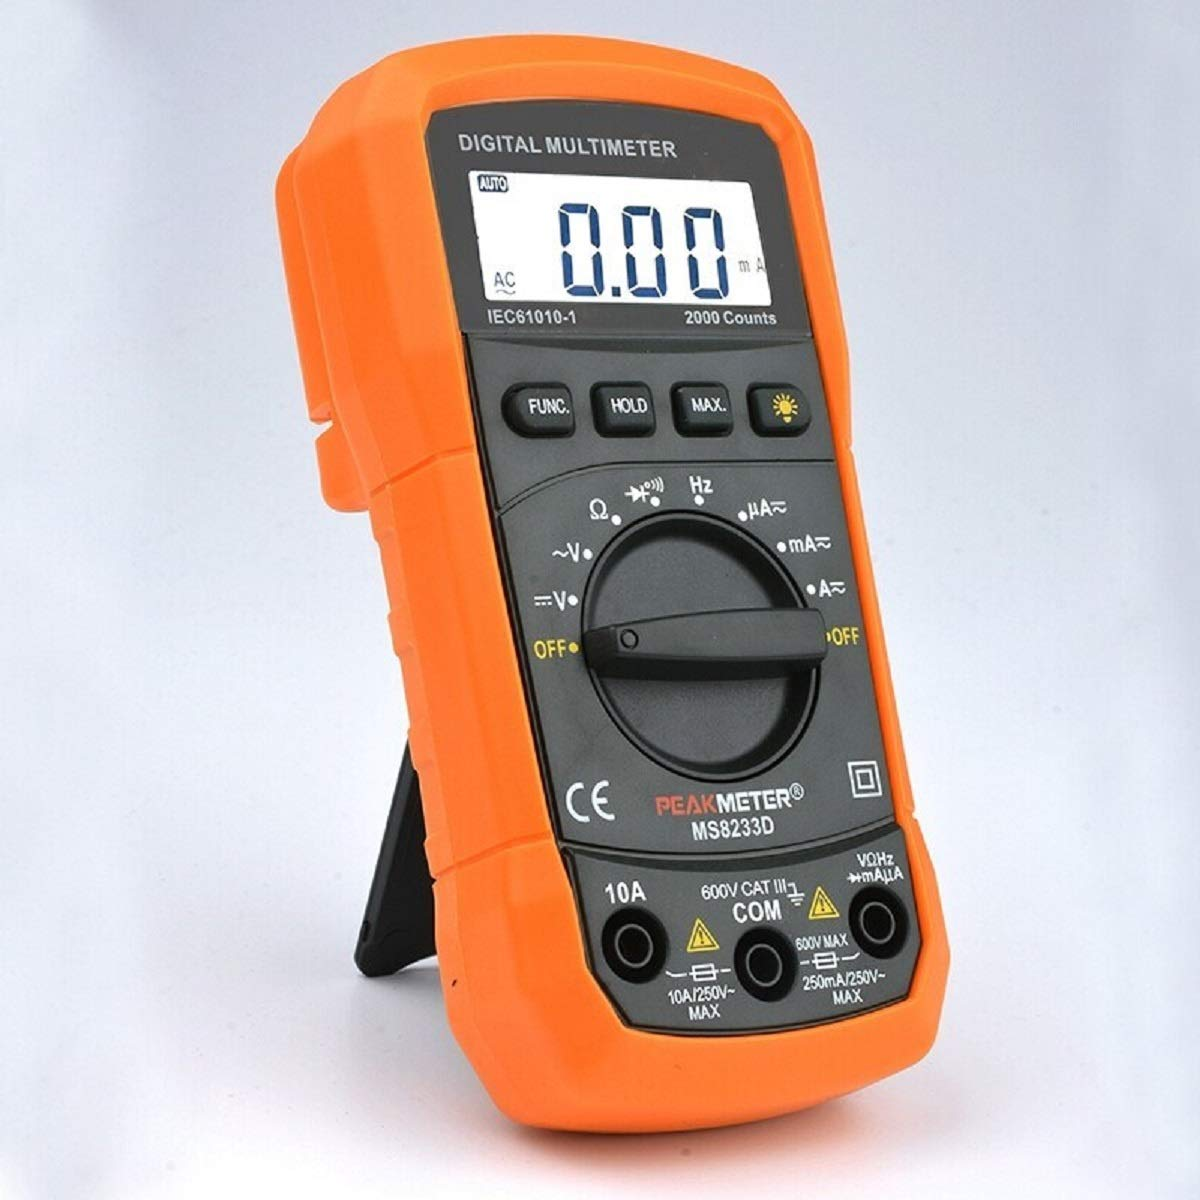 Digital Multimeter Electronic Measuring Test Meter Multi Tester Details About Circuit Voltmeter Portable Voltage Measurement Tool Chuchuang